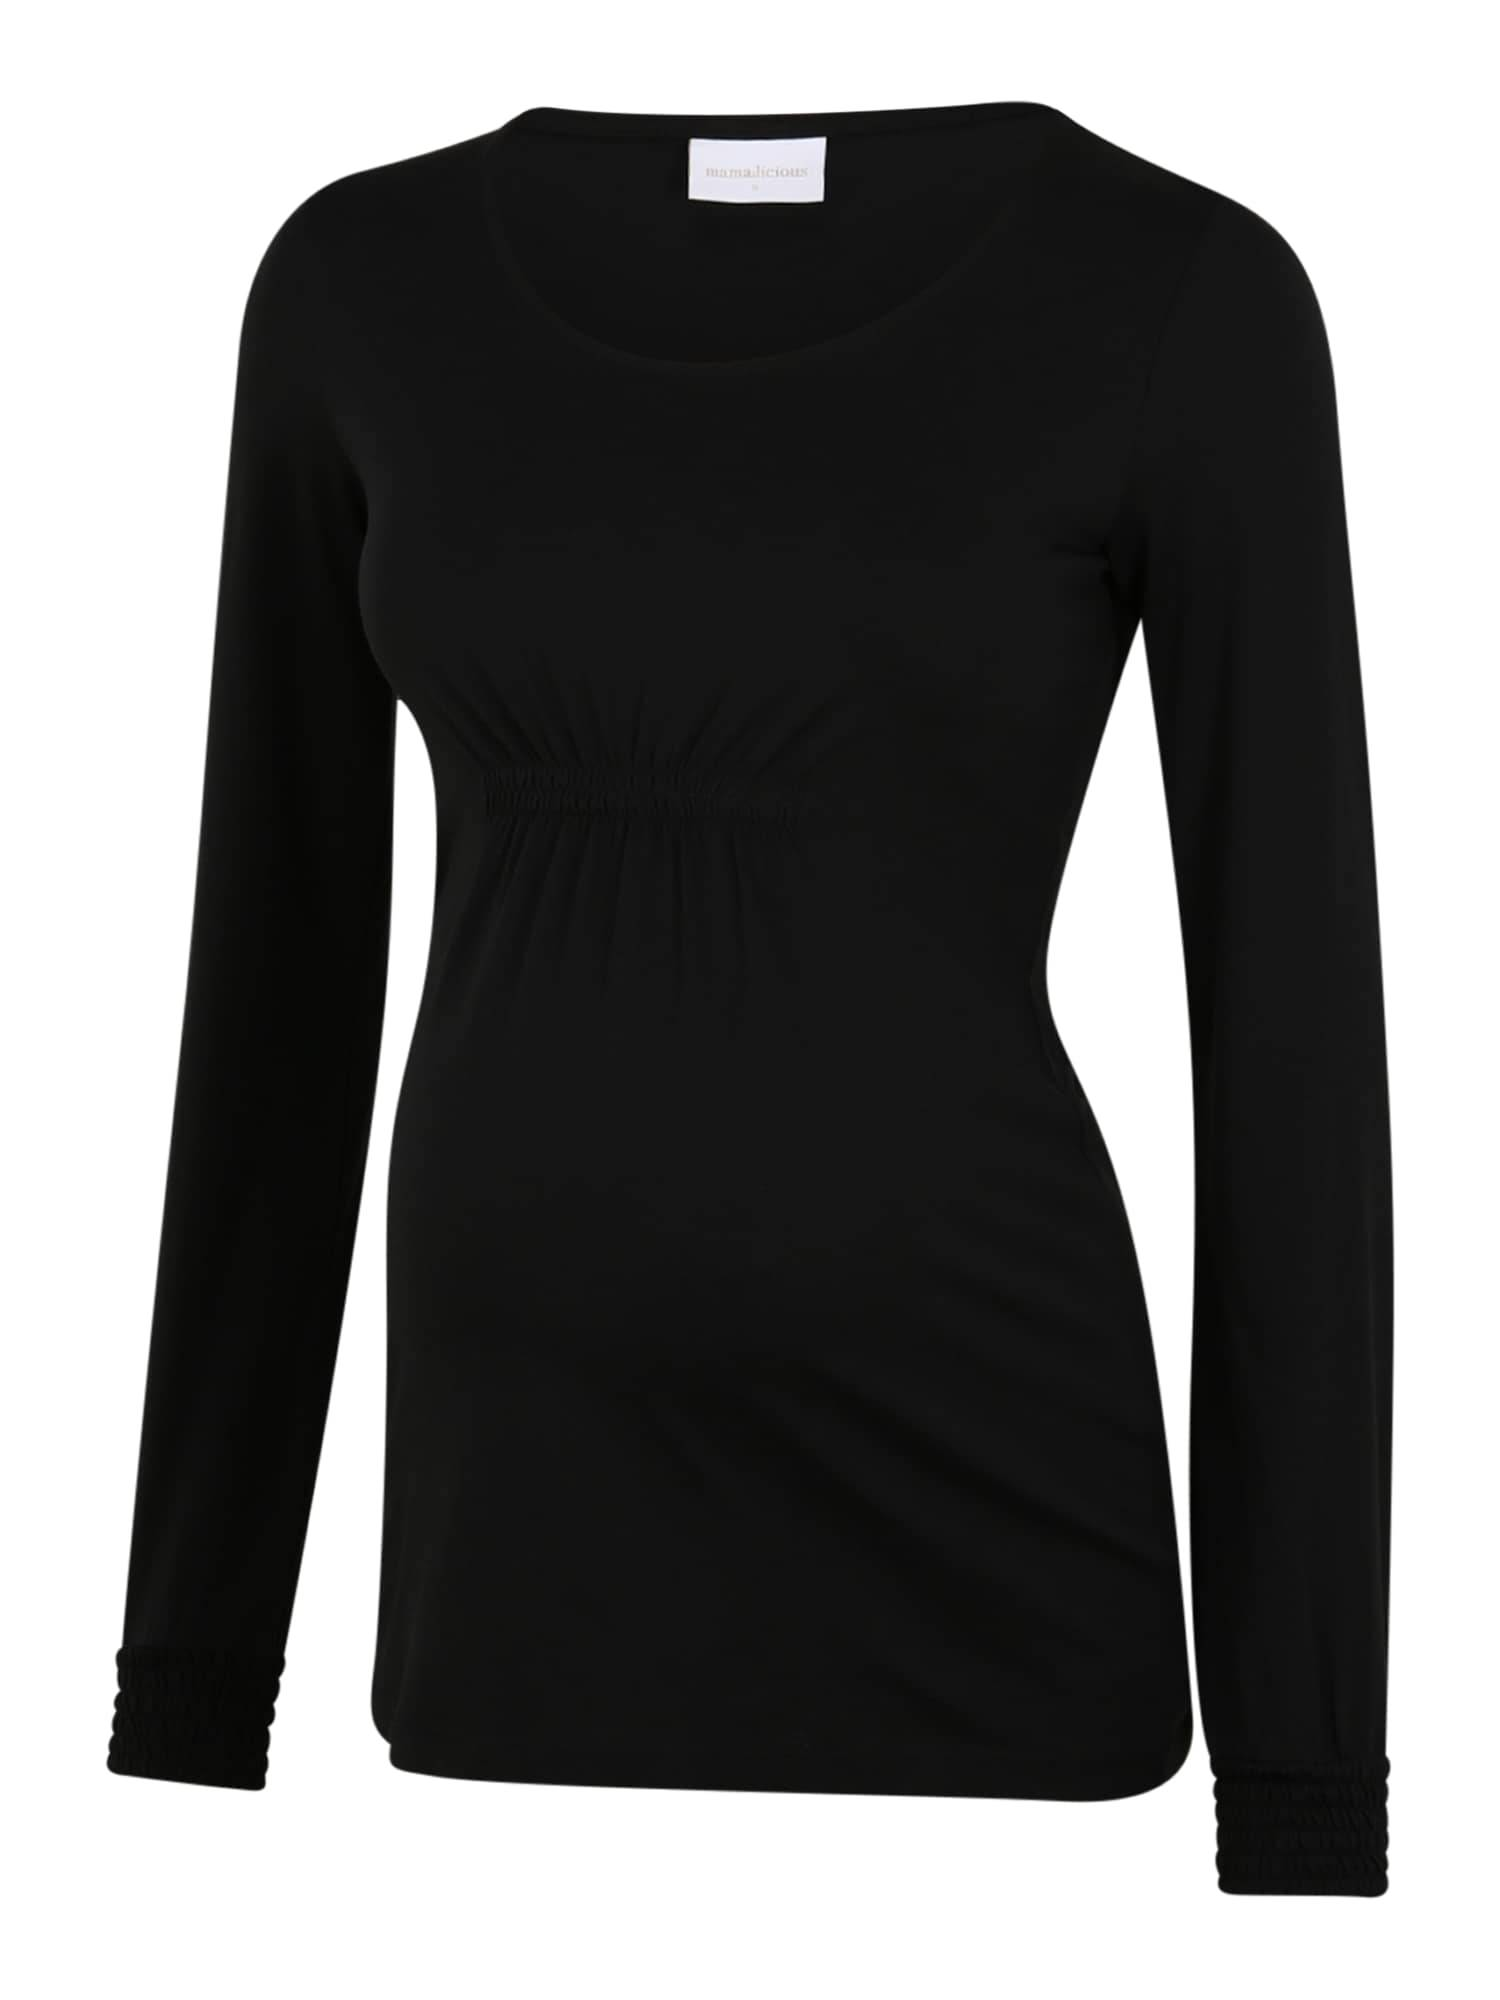 MAMALICIOUS T-shirt 'Minna'  - Noir - Taille: M - female